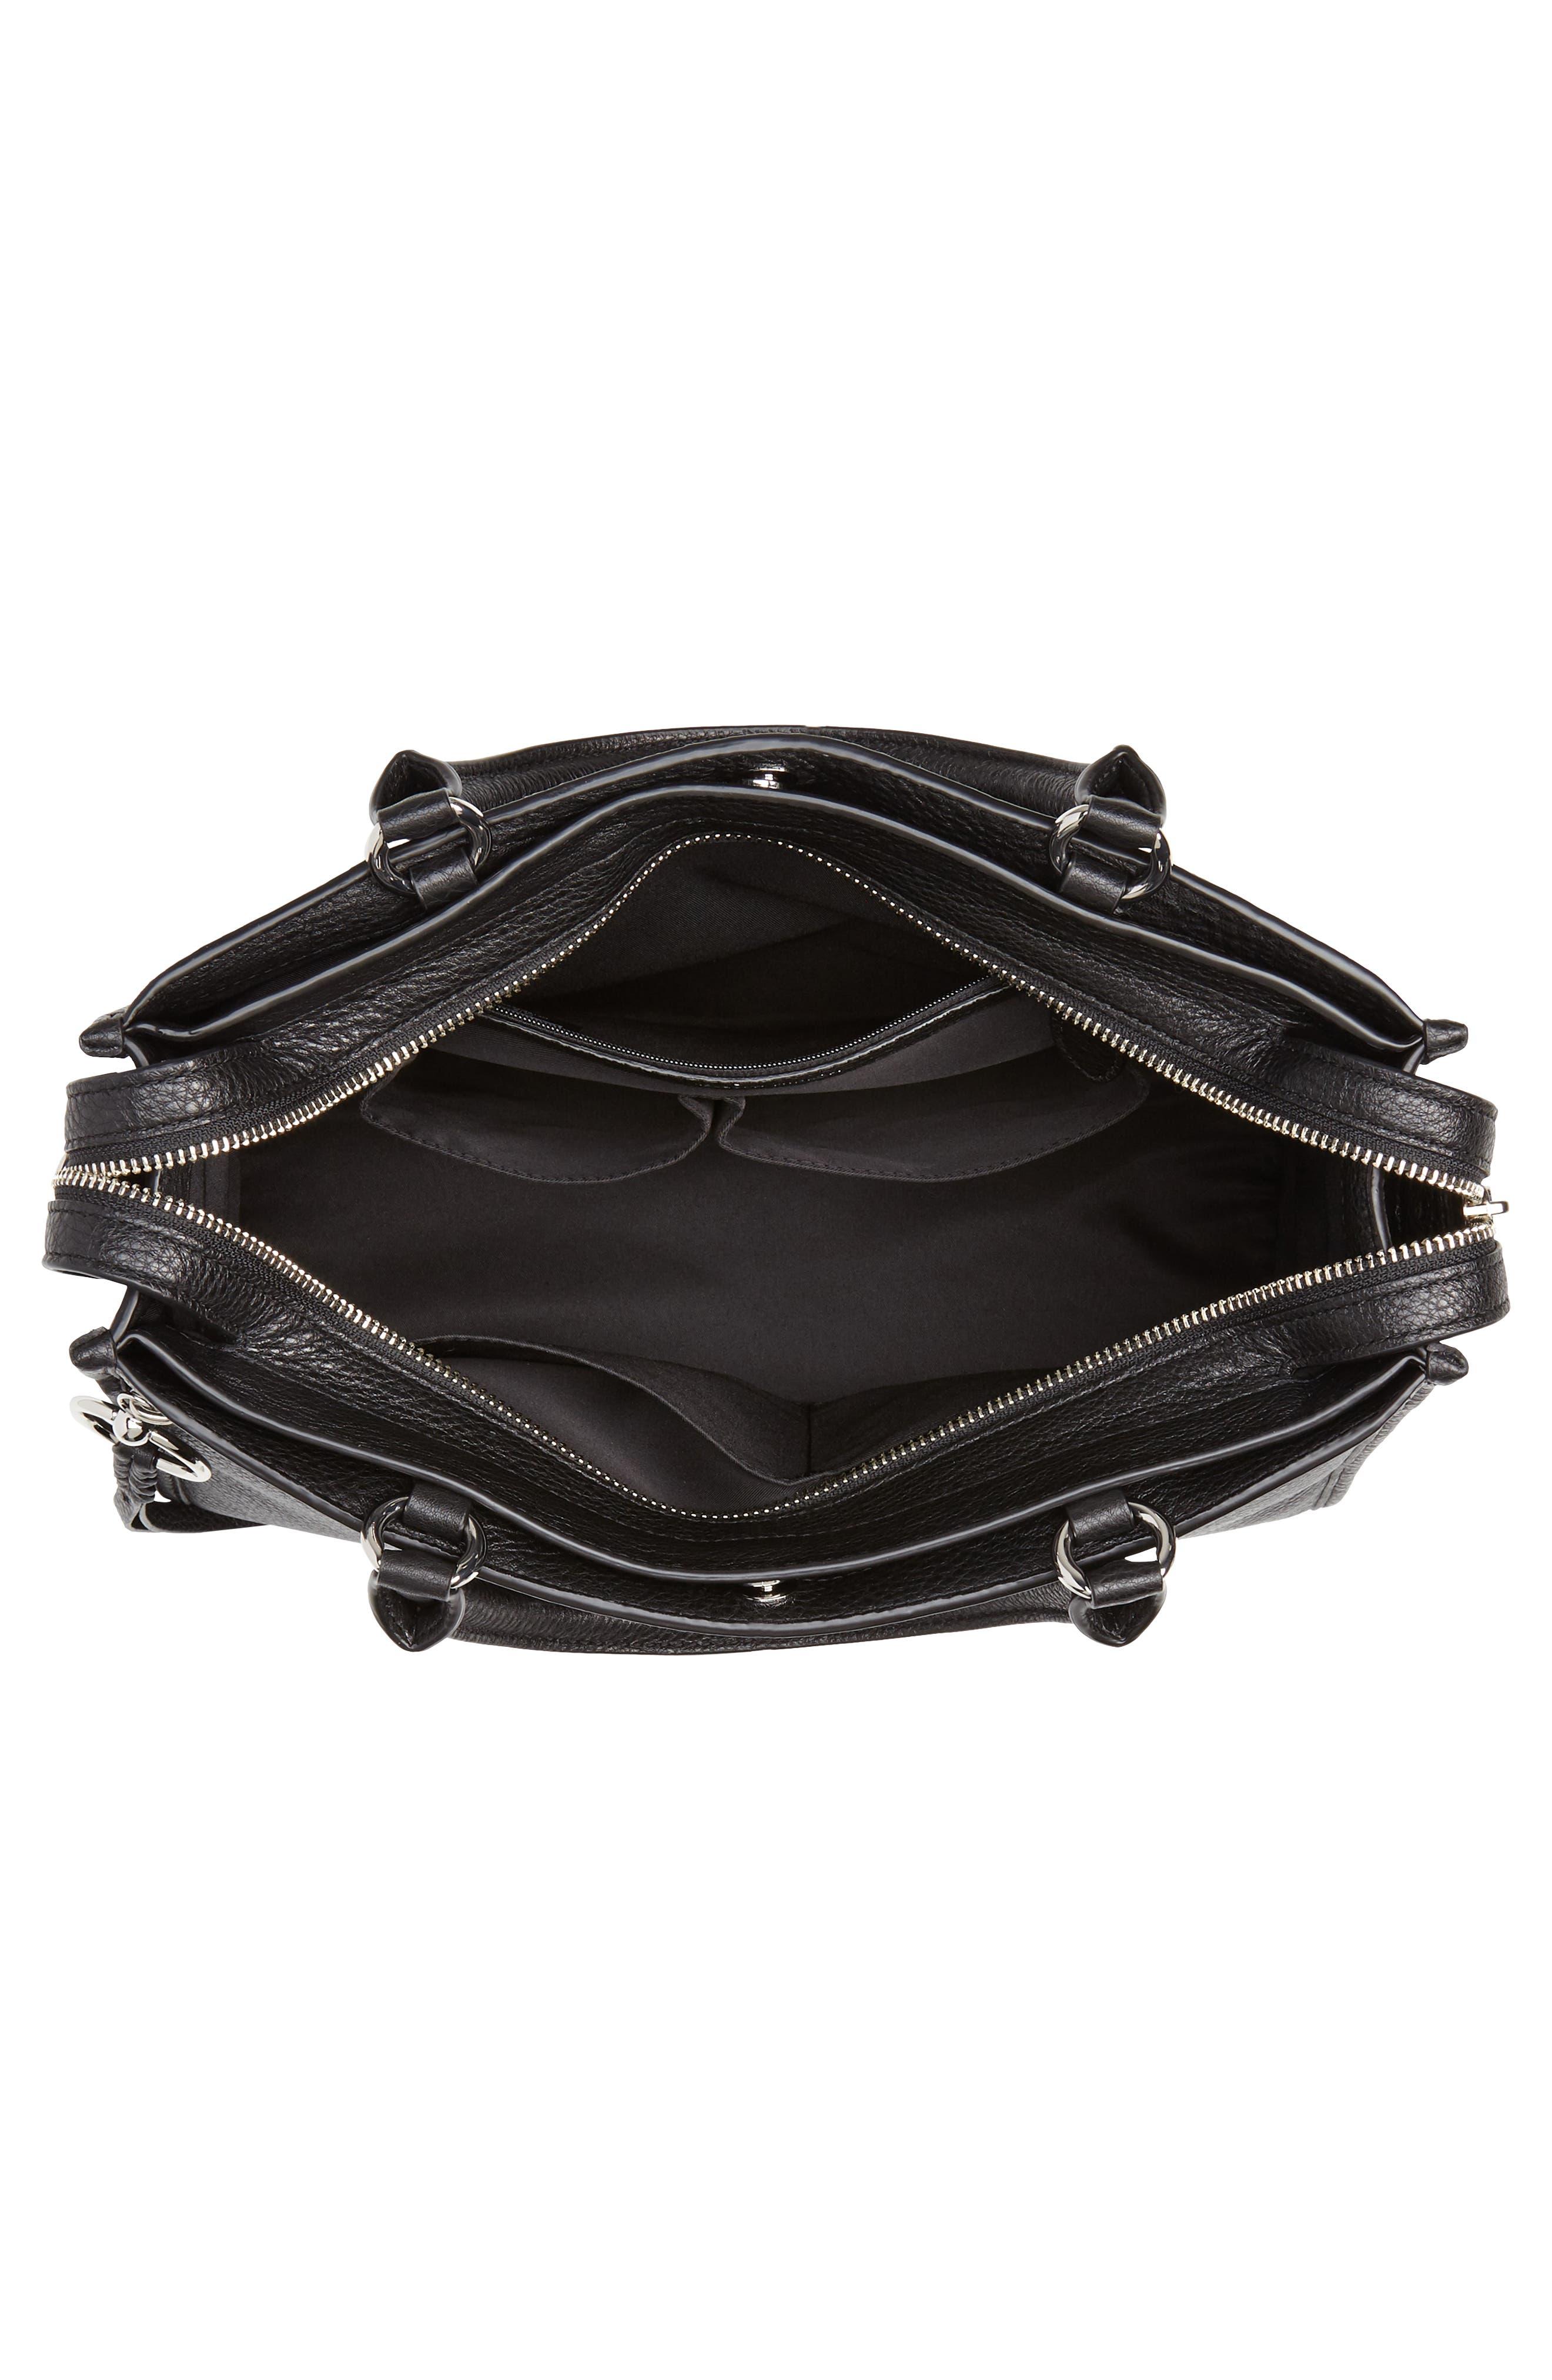 REBECCA MINKOFF, Bedford Zip Leather Satchel, Alternate thumbnail 5, color, BLACK